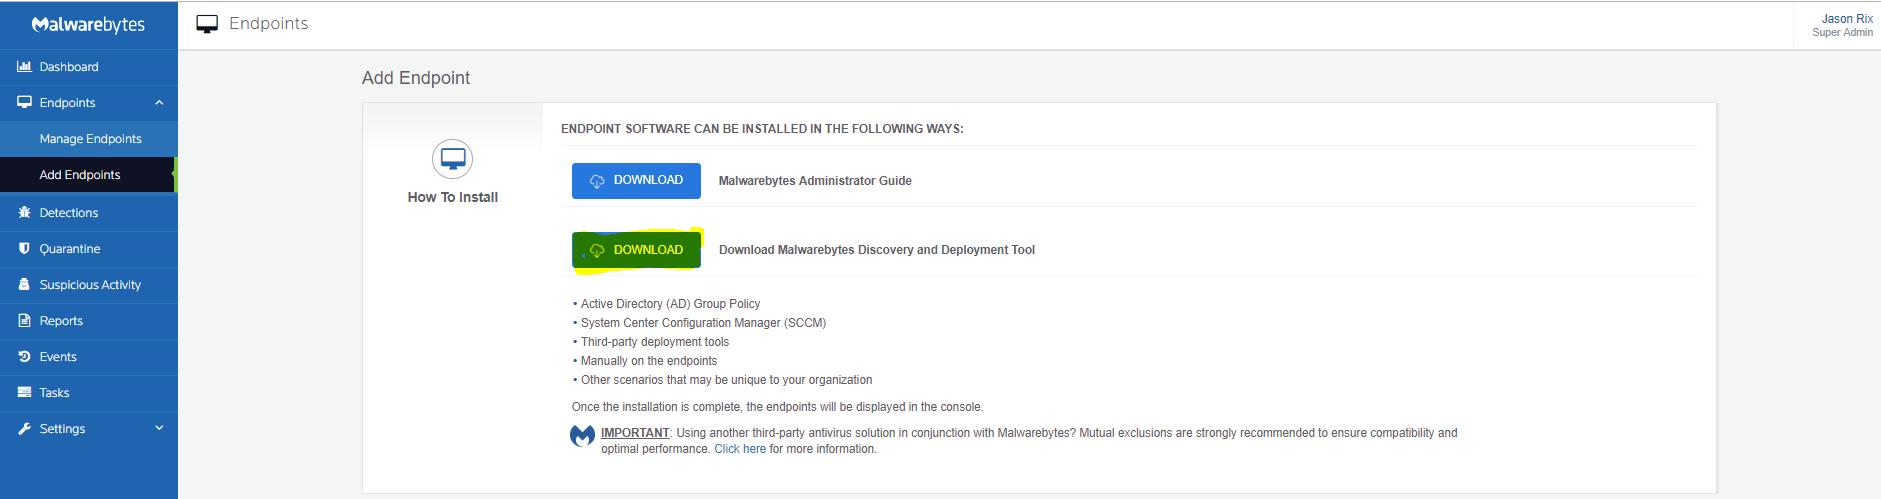 Error updating Discovery & Deployment Tool - Malwarebytes